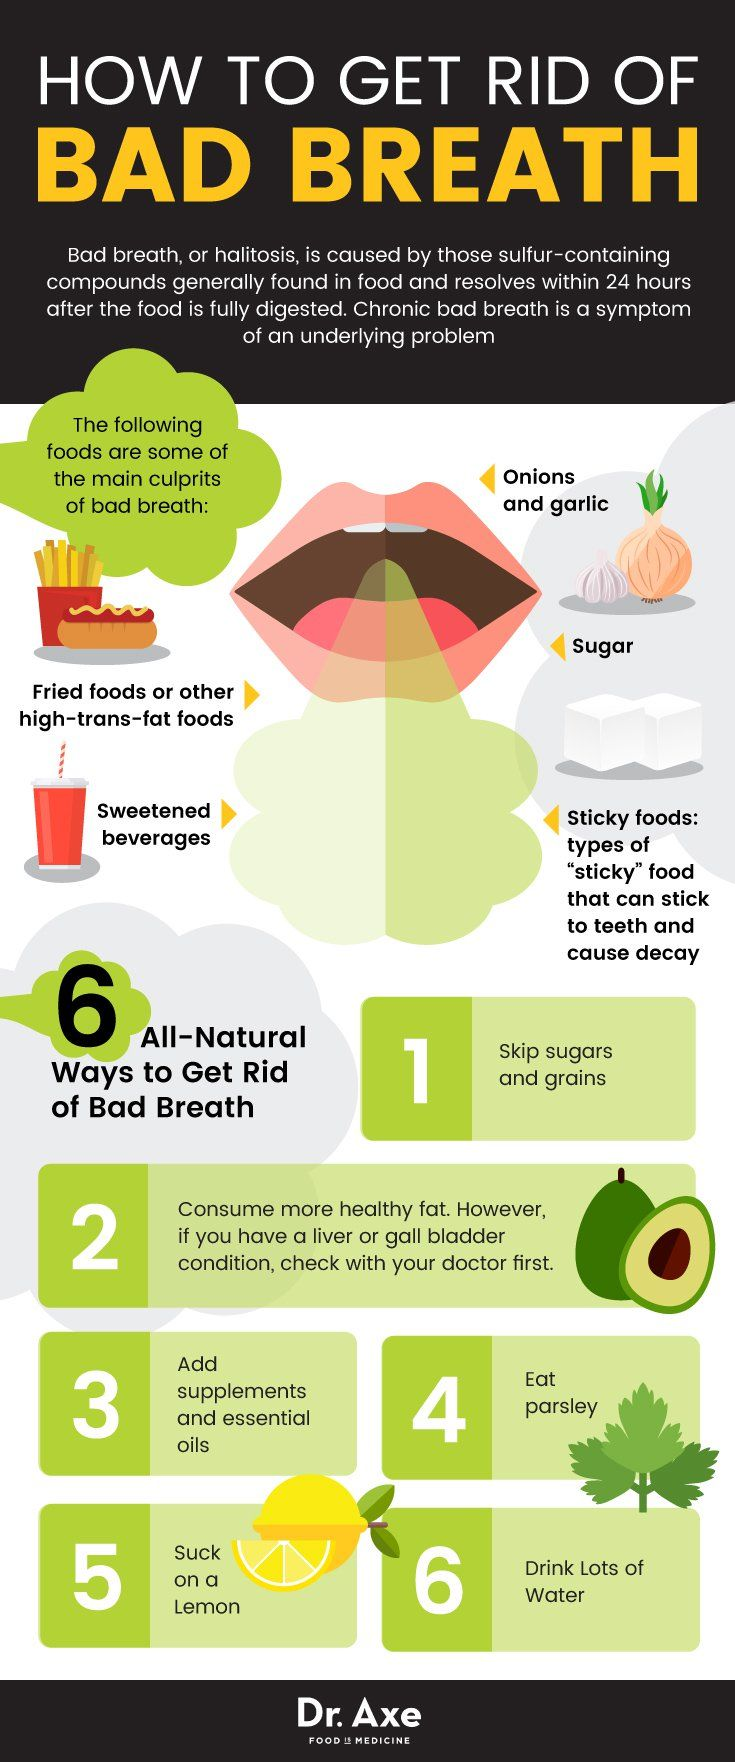 how to get rid of poop breath